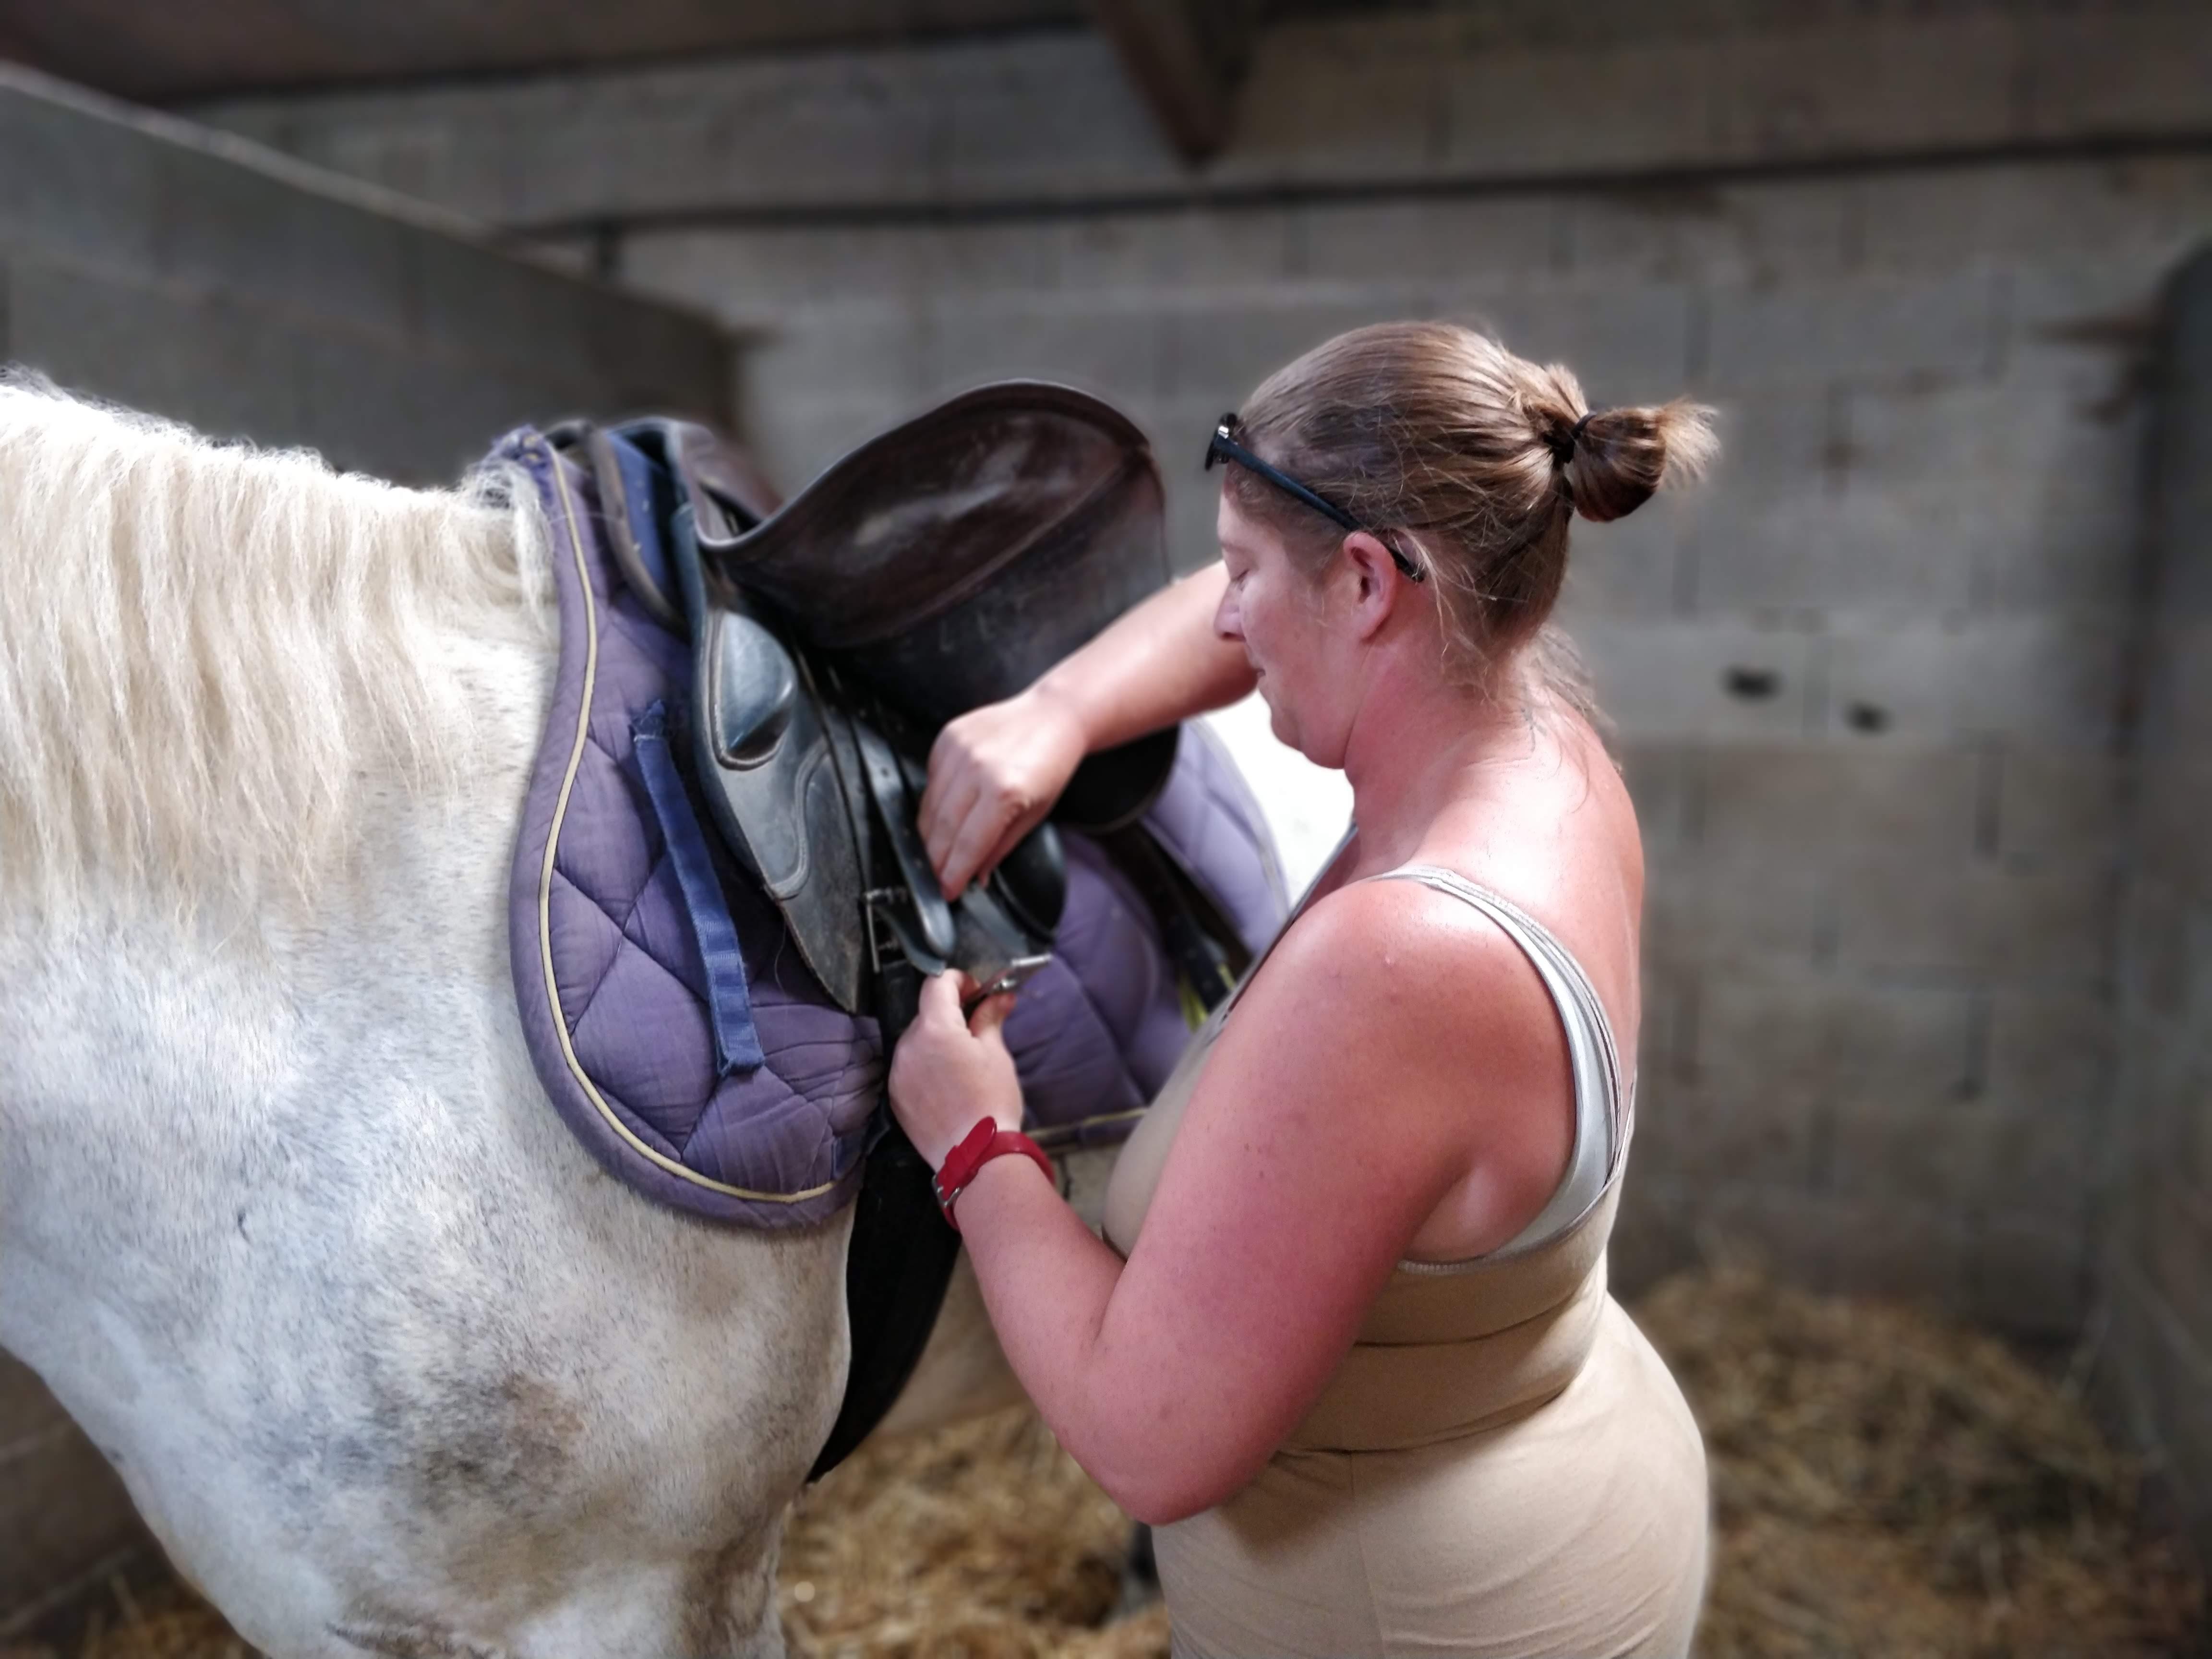 [EMPLOI] Enseignant Equestre (H/F) CDI Plein temps